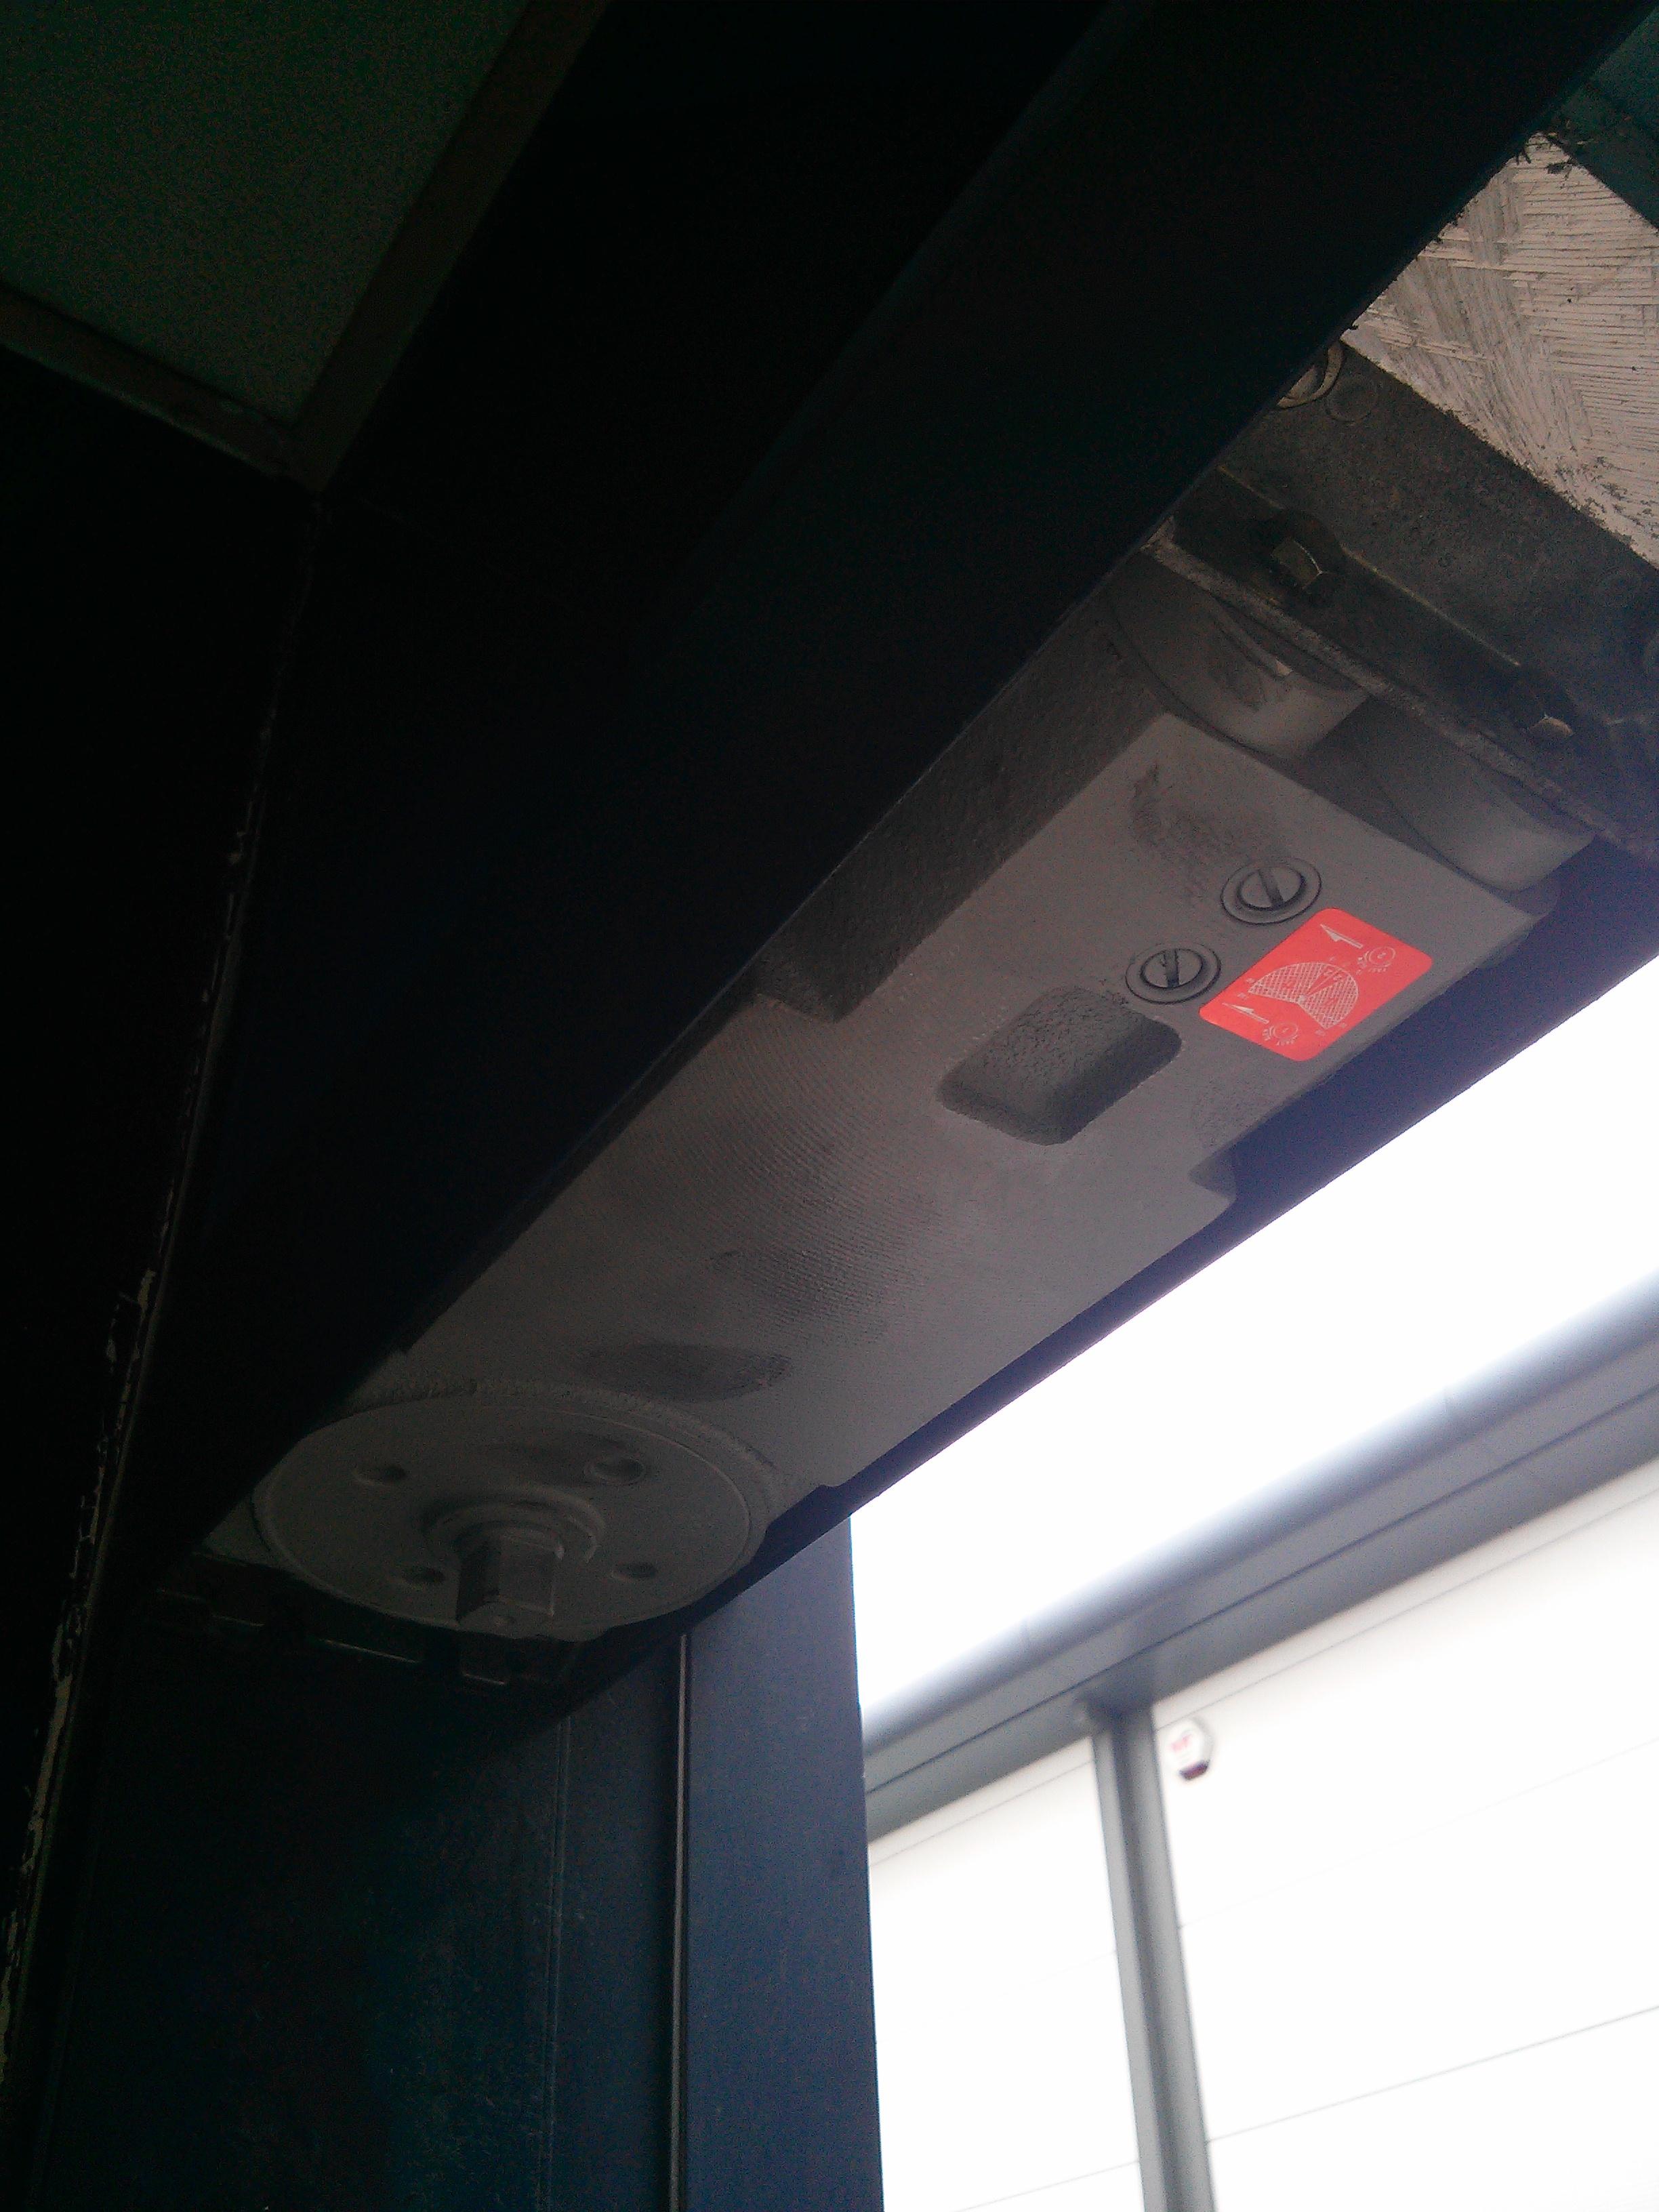 baton garage door us automatic motion hottechreviews closer sensor collection doors of rouge pinterest beautiful